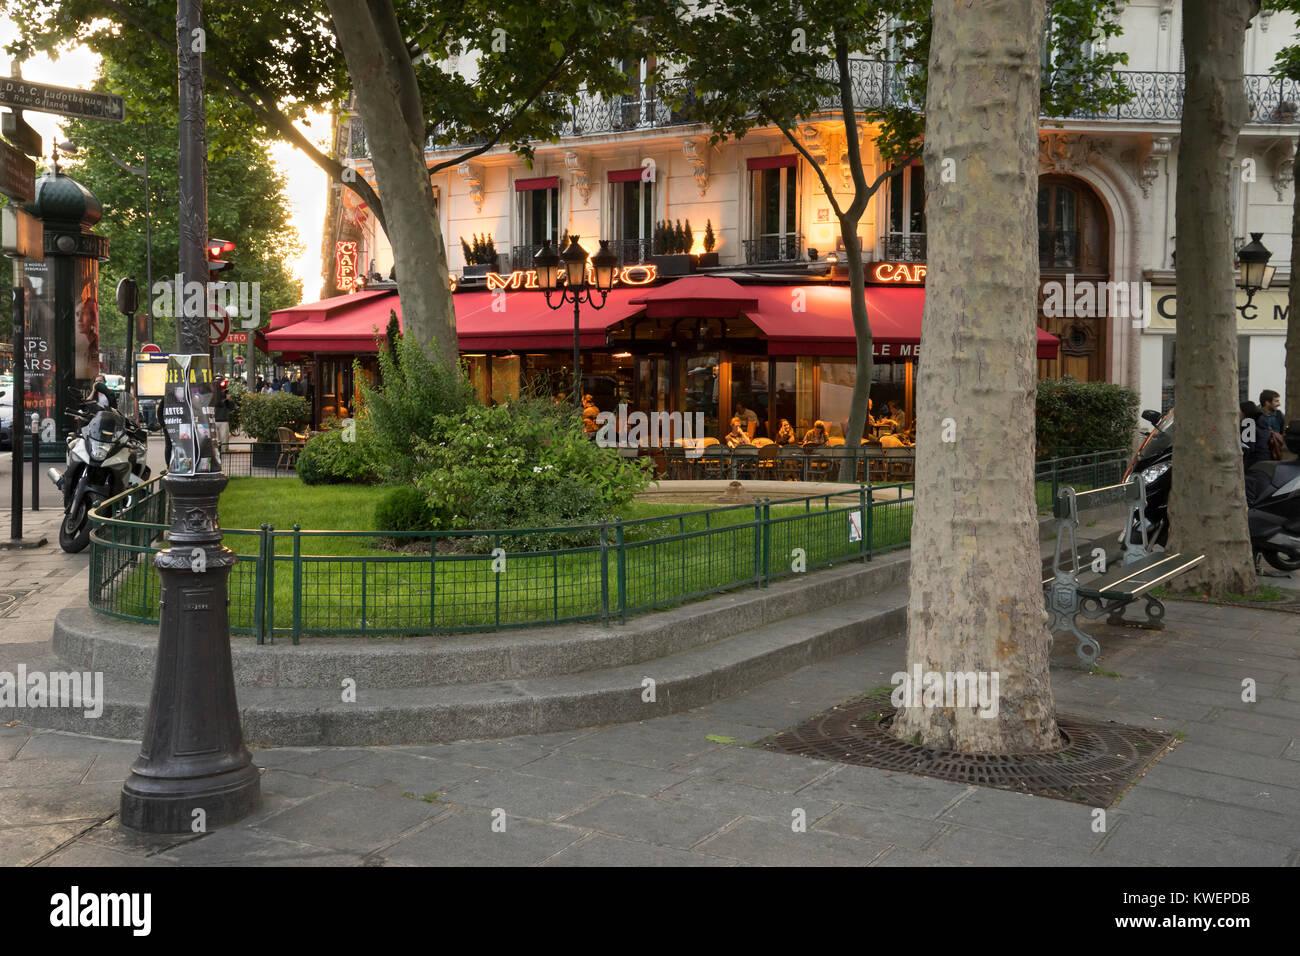 France, Paris, Cafe/restaurant in 5th arrondissement - Stock Image